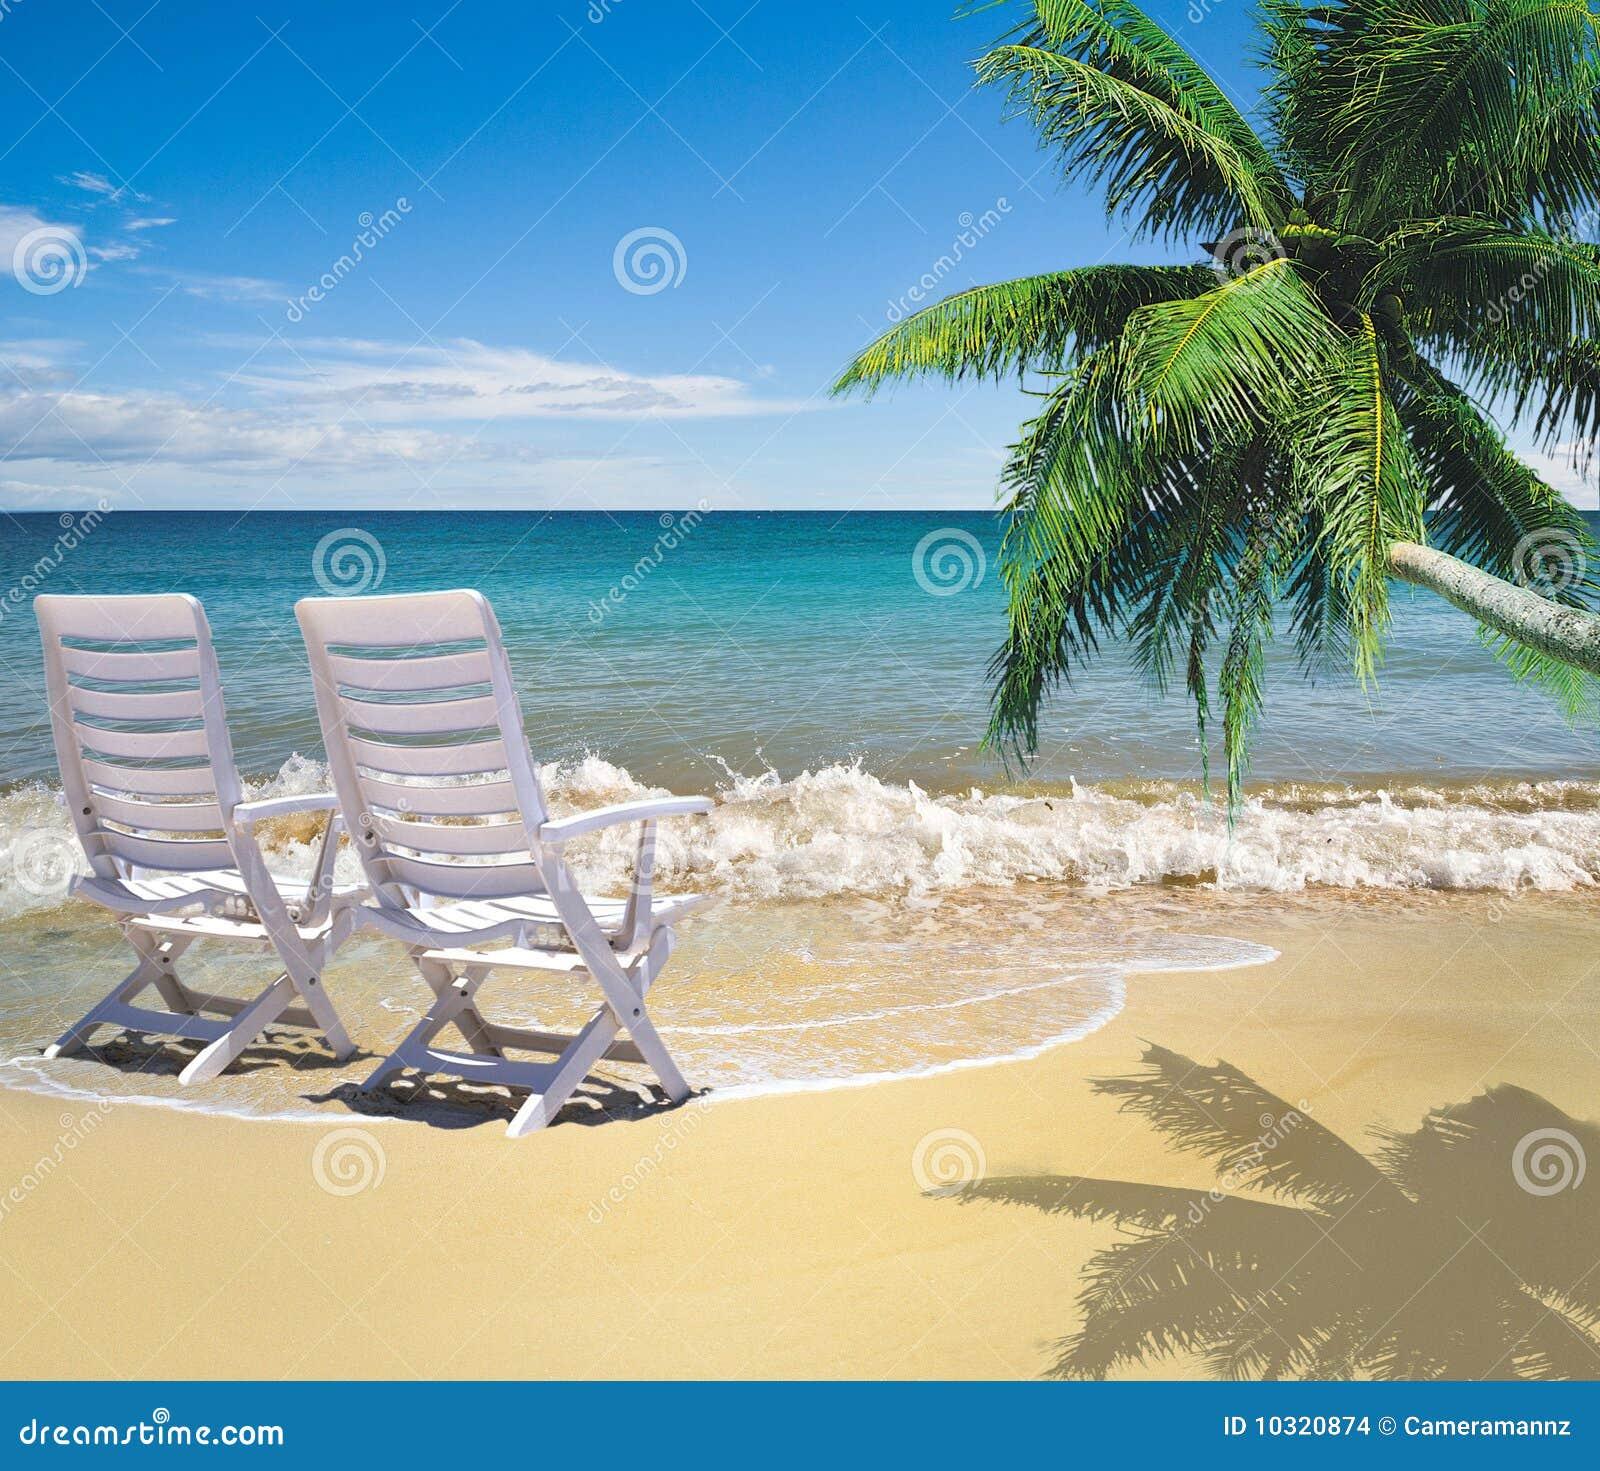 Relaxing On Beautiful Beach Stock Photo